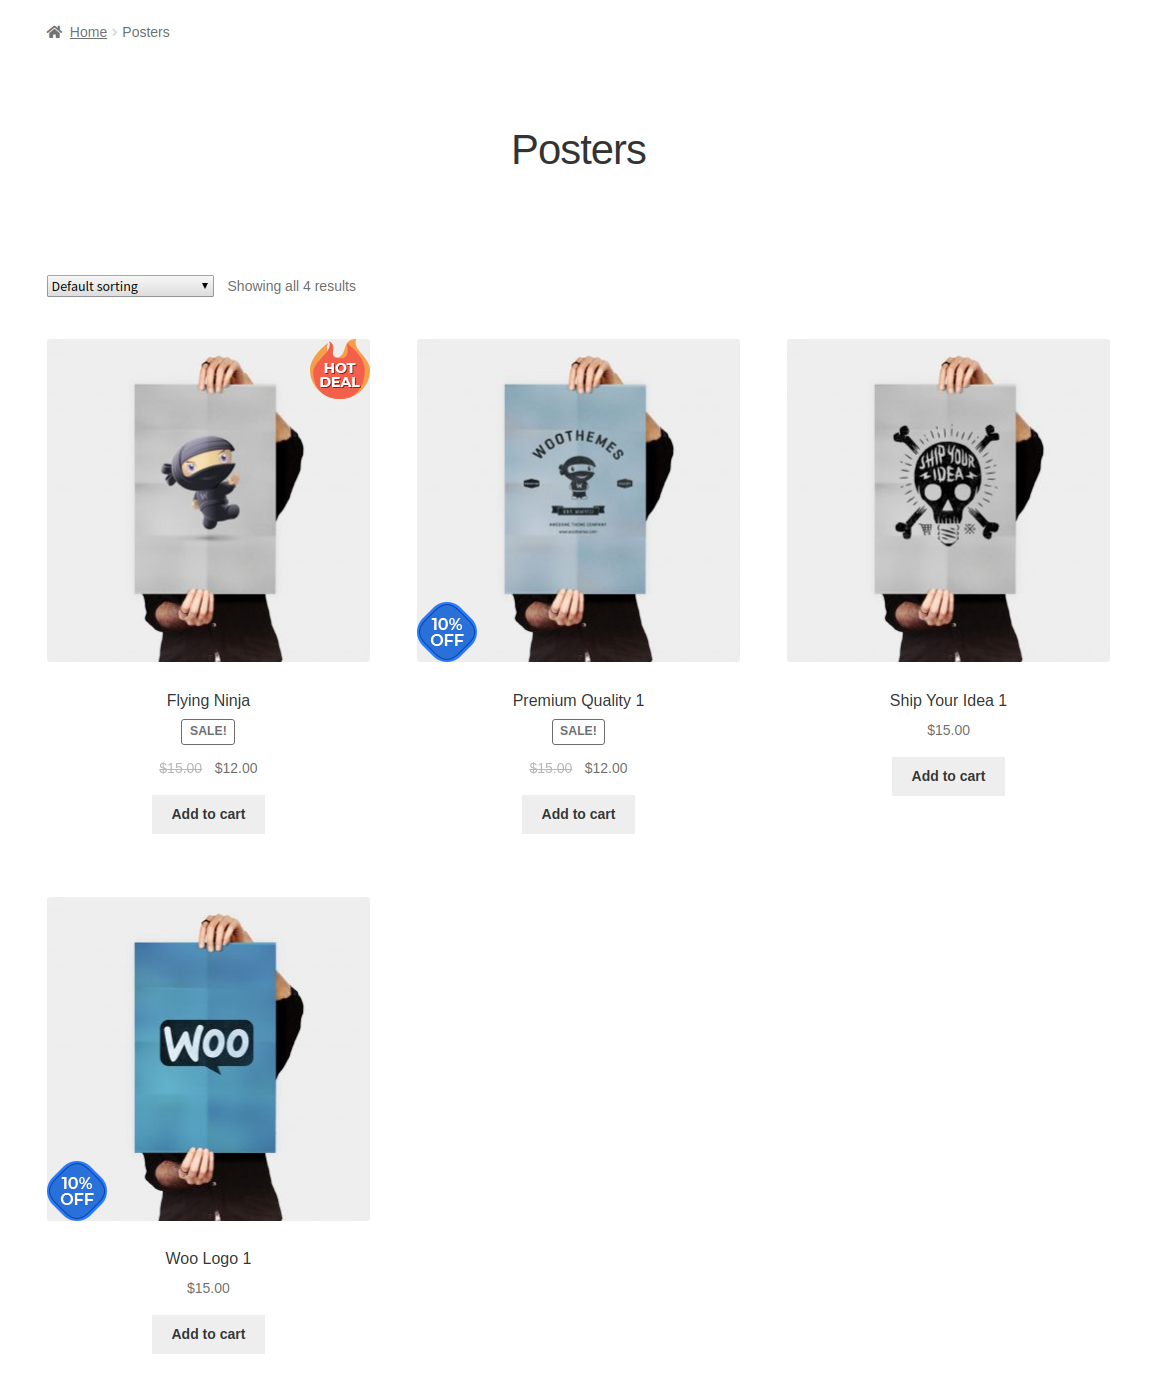 webkul-woocommerce-custom-product-label-visibility-on-category-page